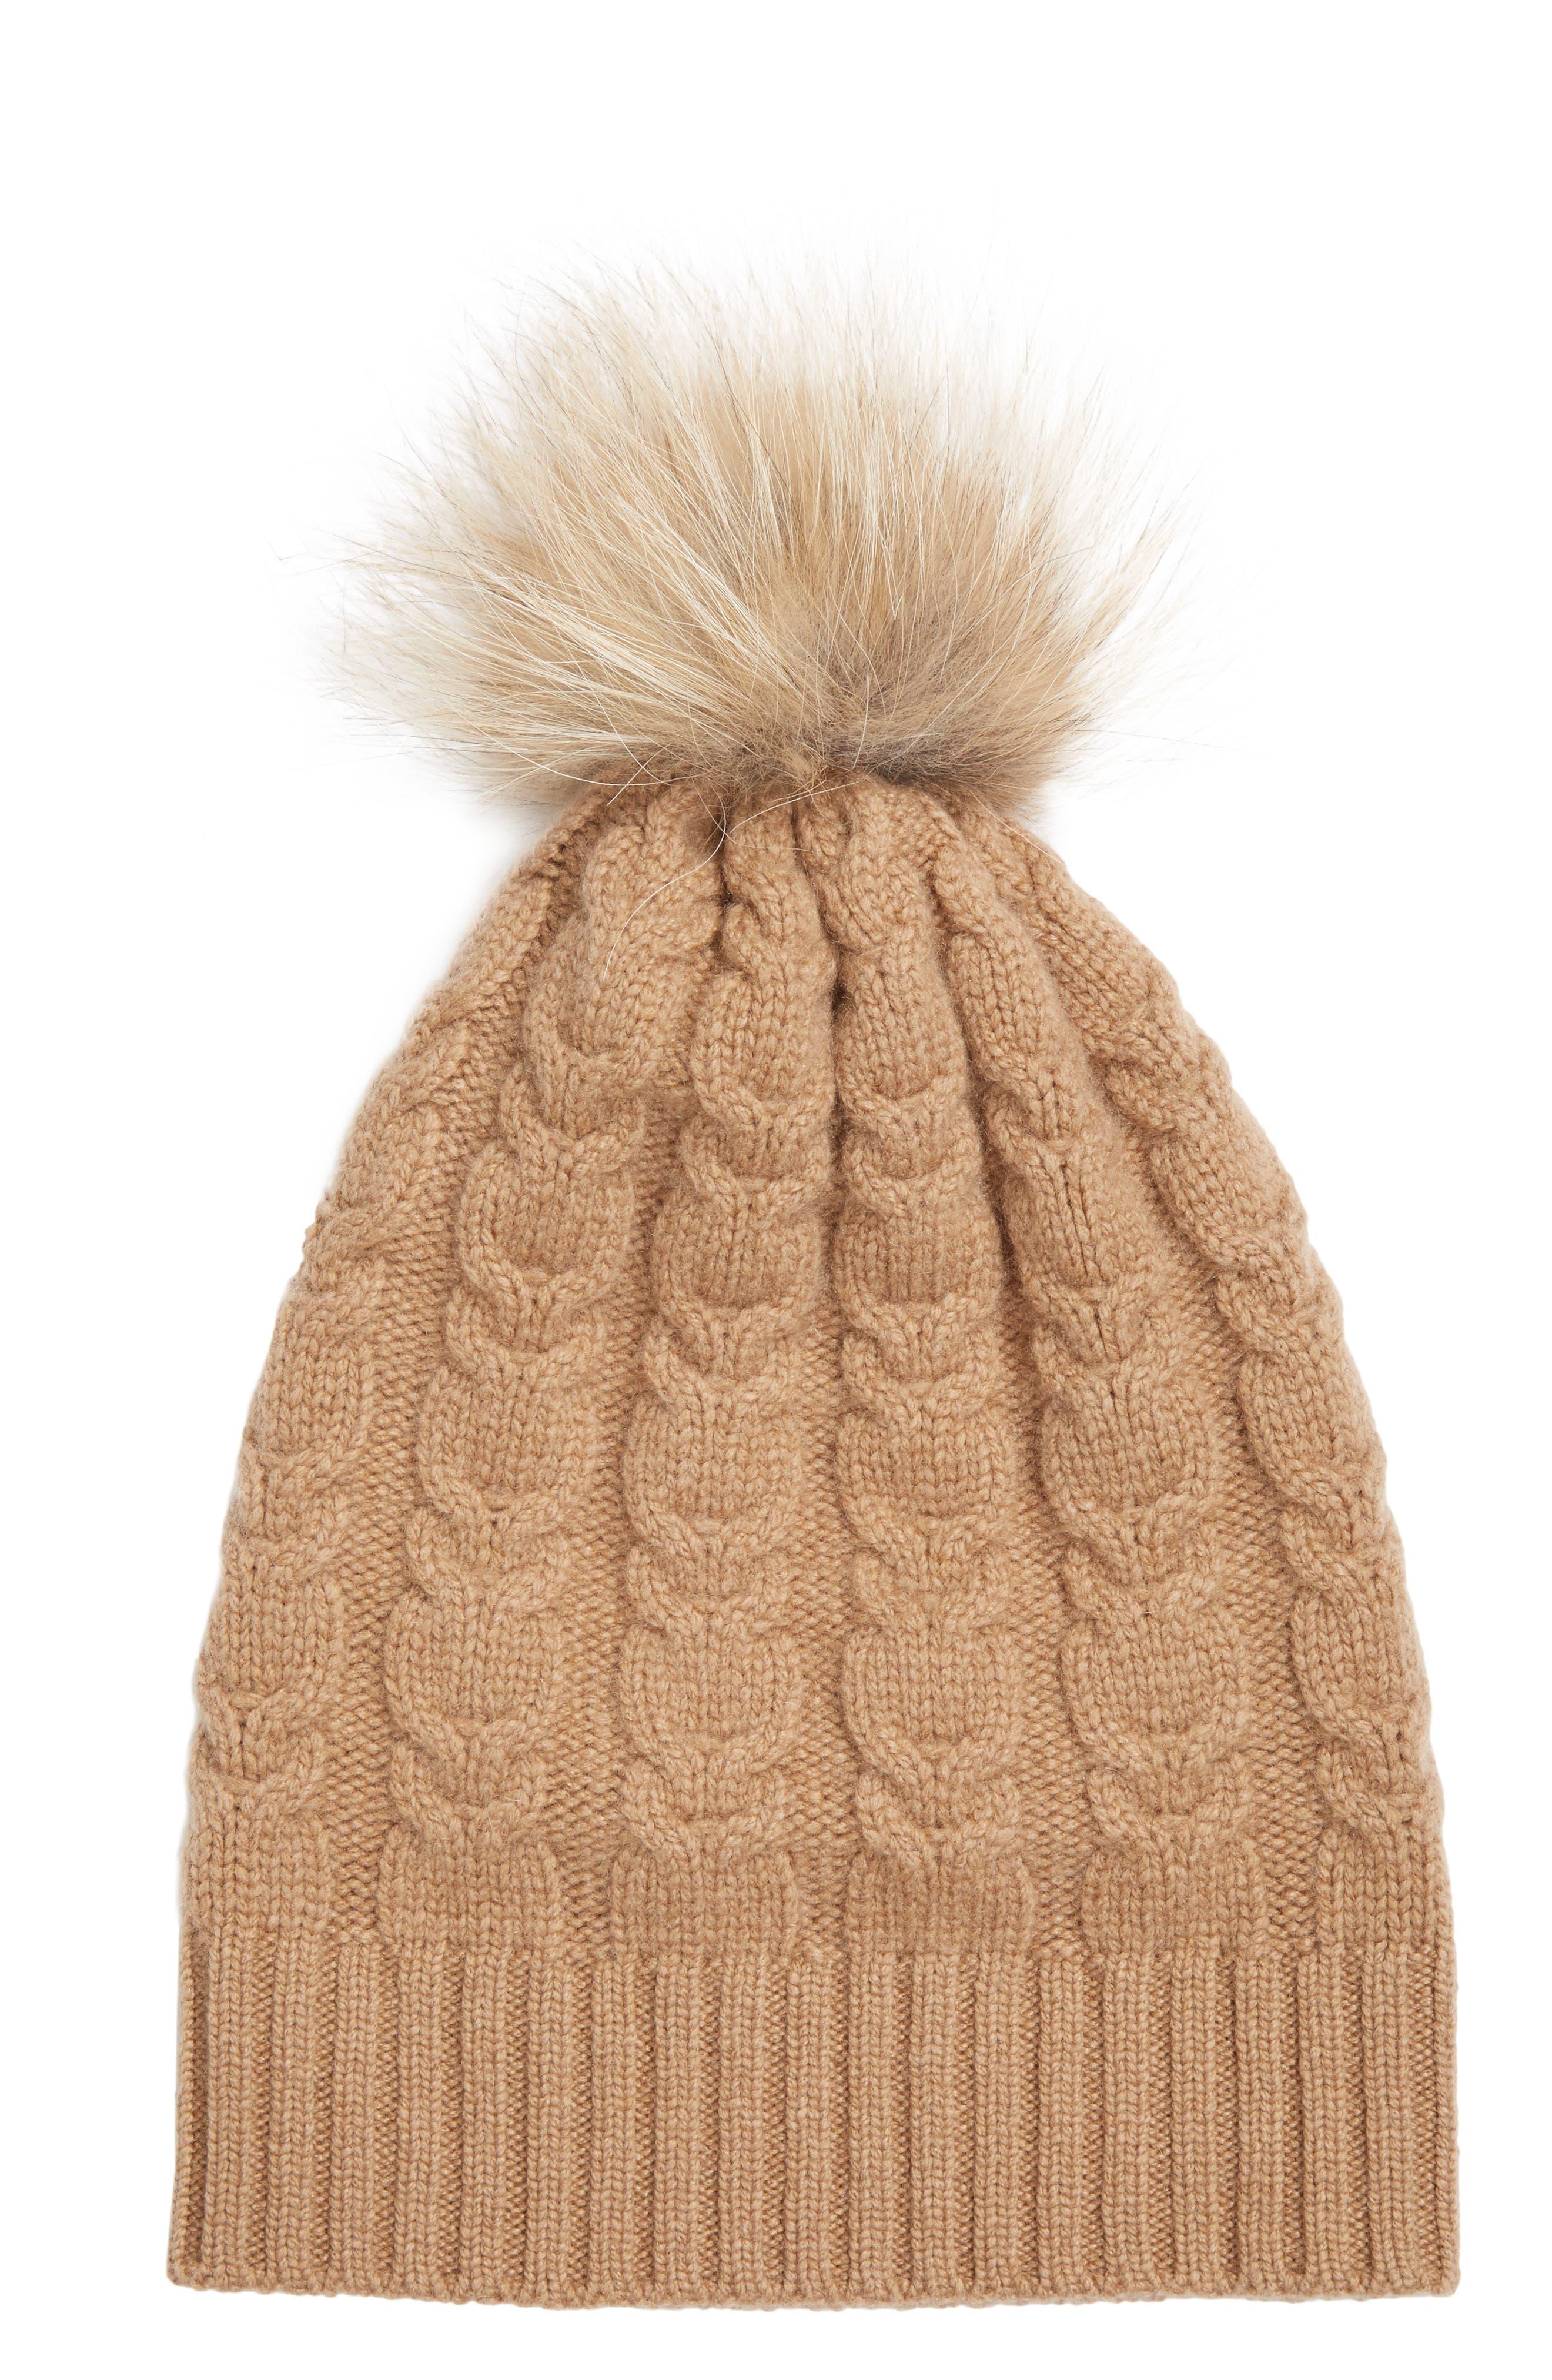 Main Image - Fabiana Filippi Cable Knit Cashmere Beanie with Genuine Fox Fur Pom